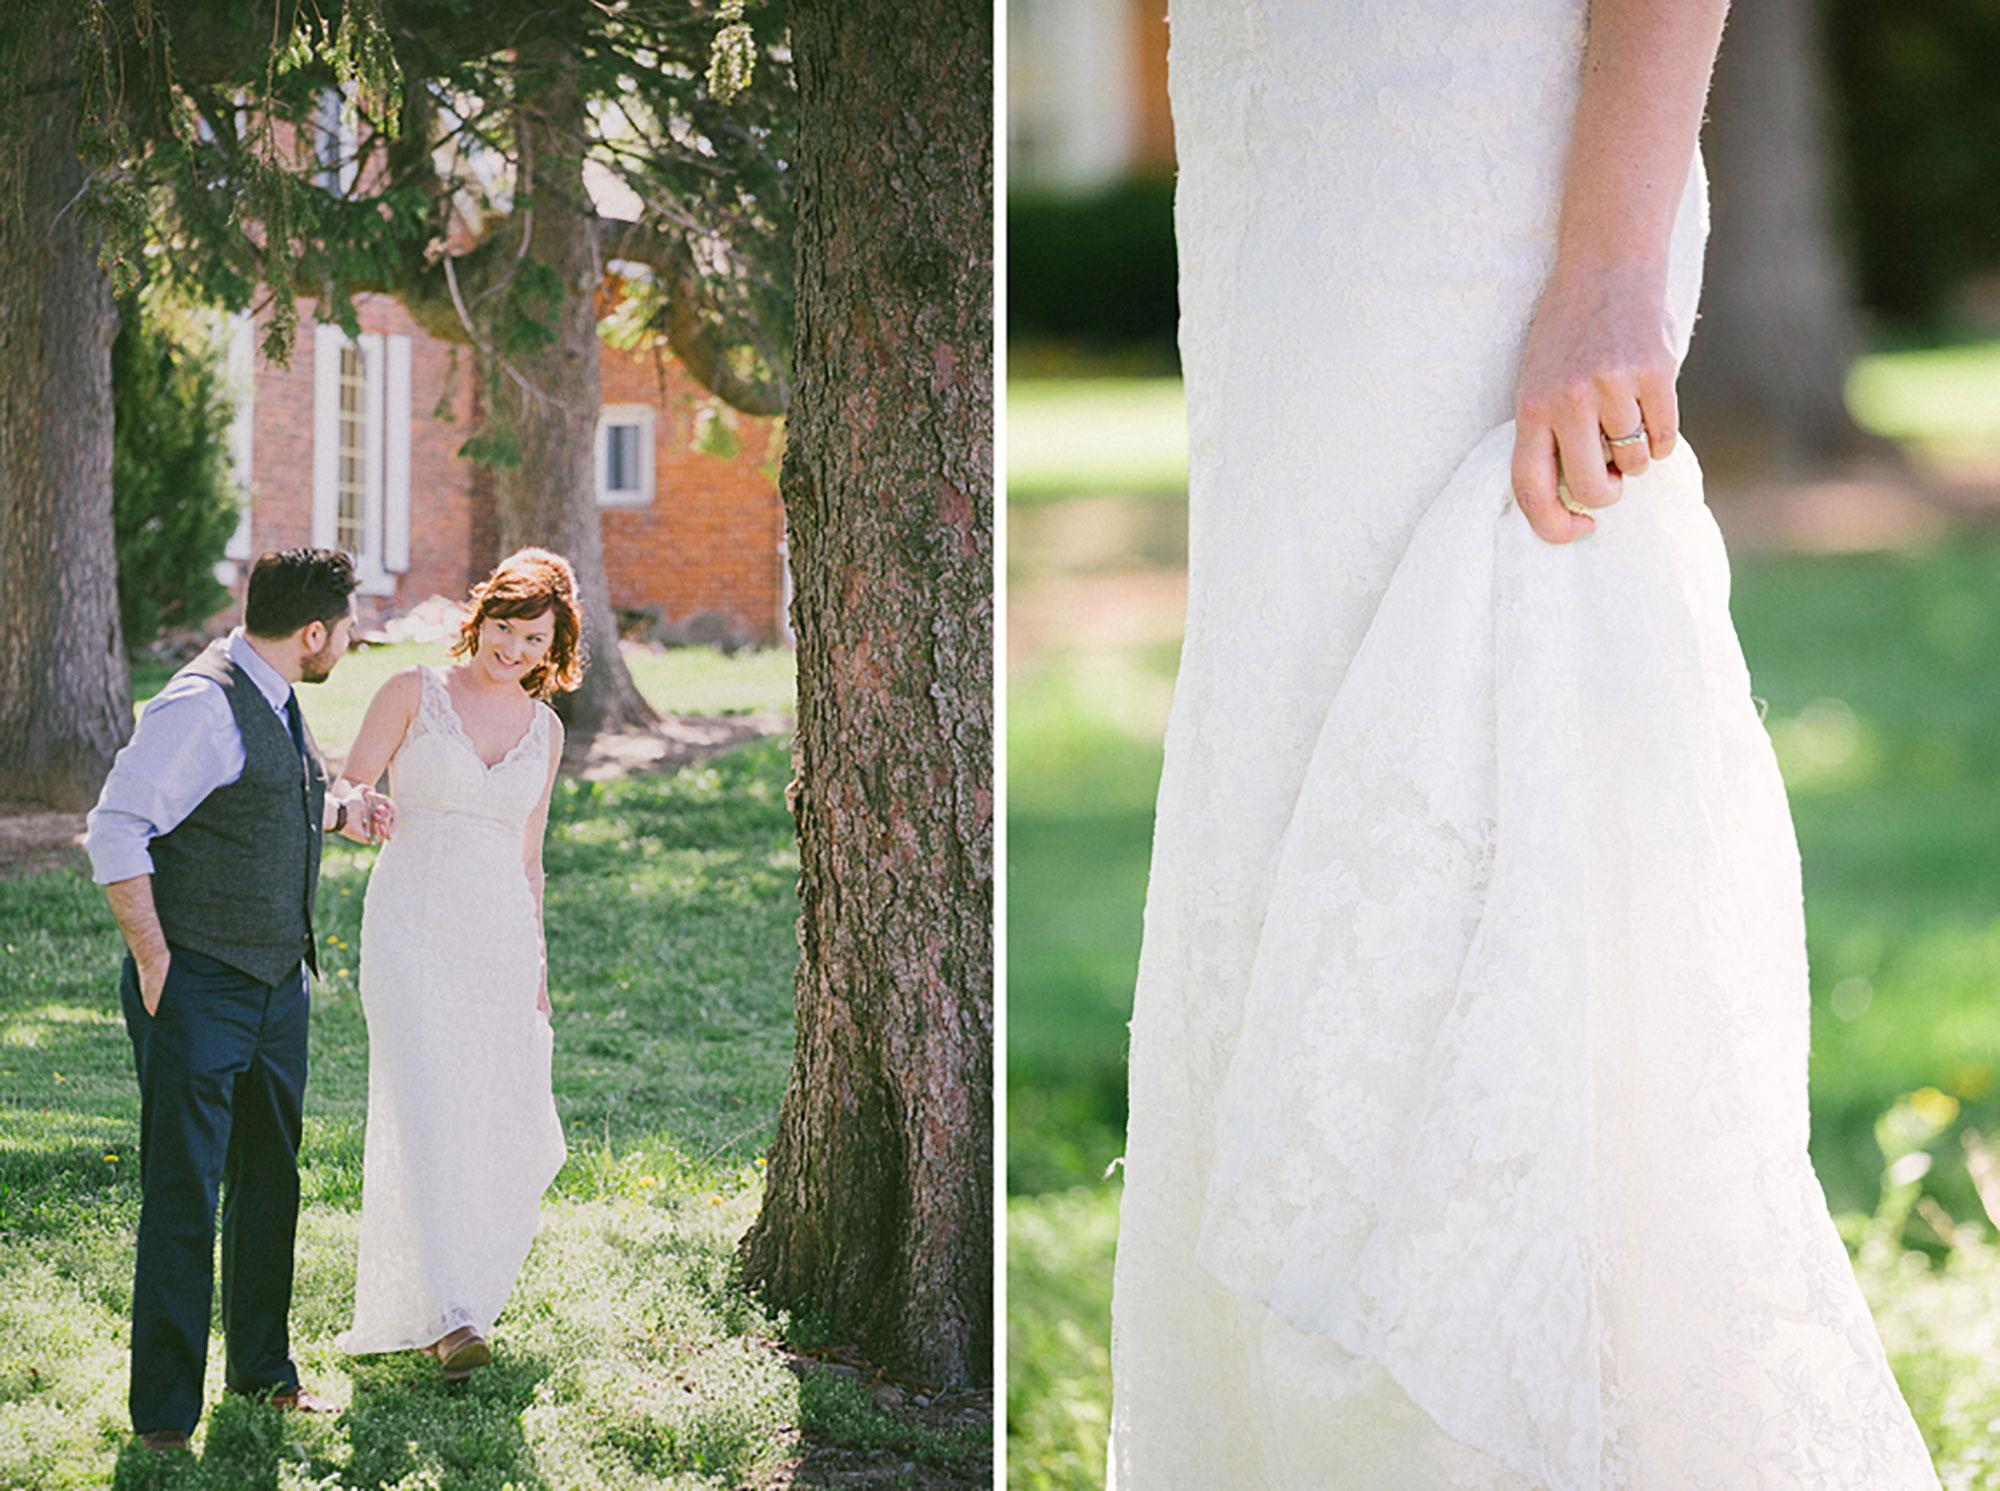 Navy-Hall-Wedding-Vineyard-Bride-Photo-By-Andrew-Mark-Photography-028.jpg